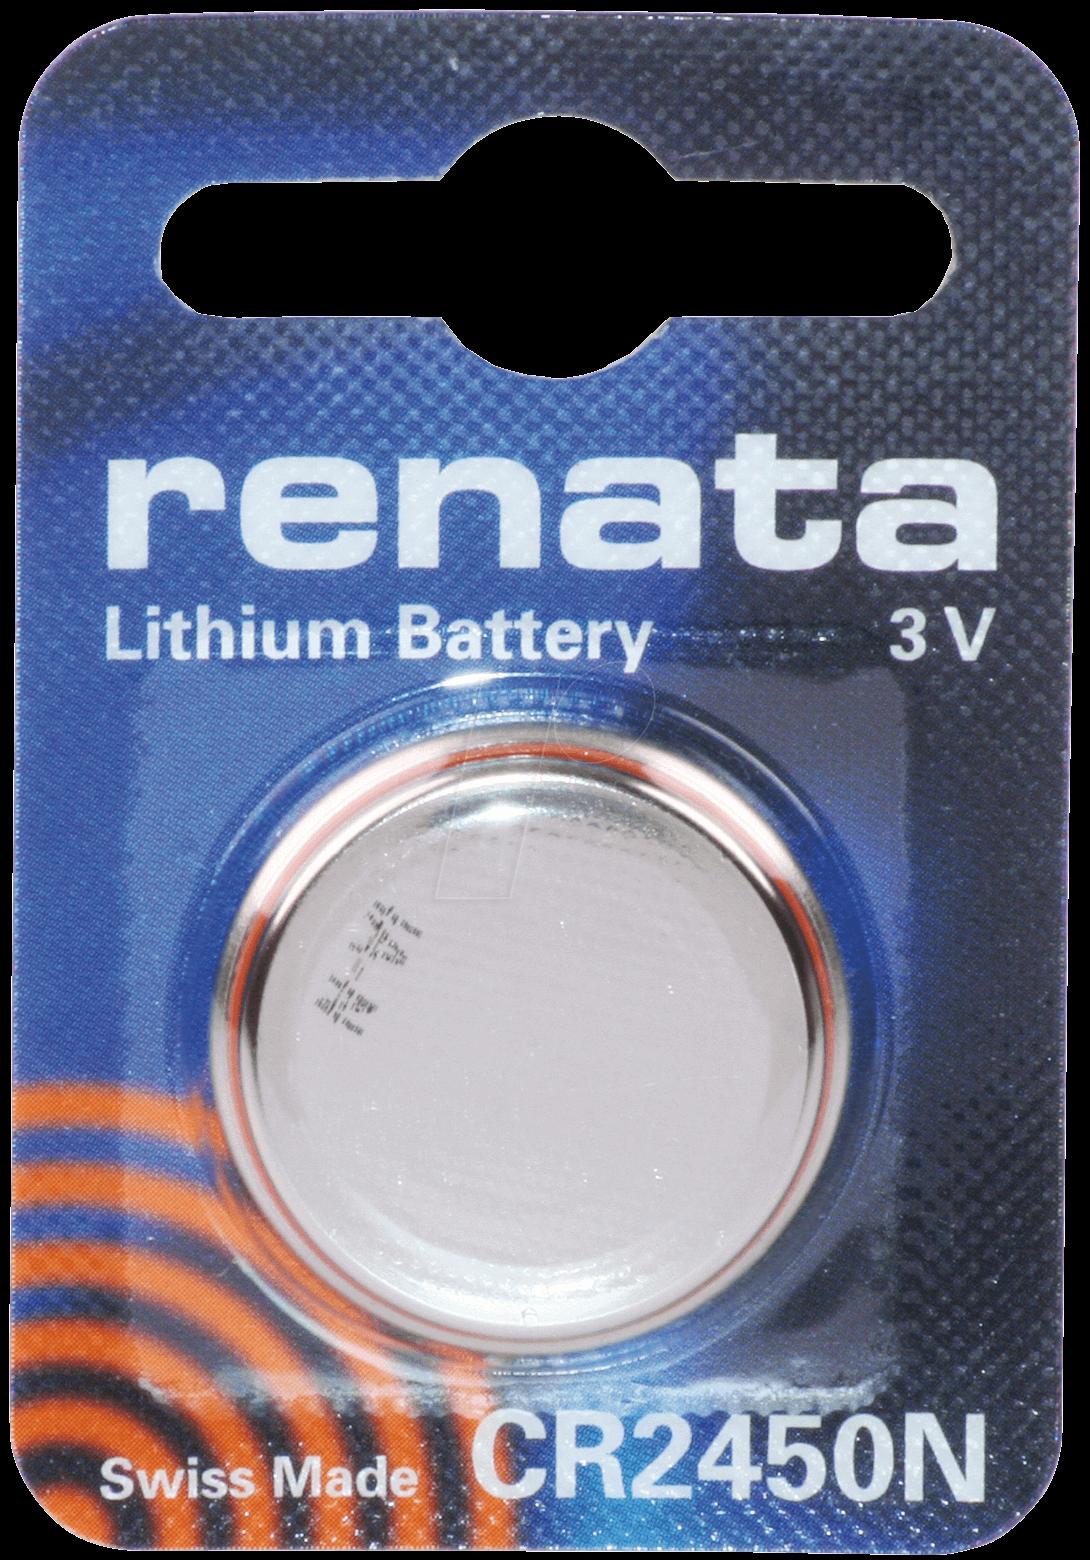 CR 1225 REN - Lithium-Knopfzelle, 3 V, 38 mAh, 12,5x2,5 mm